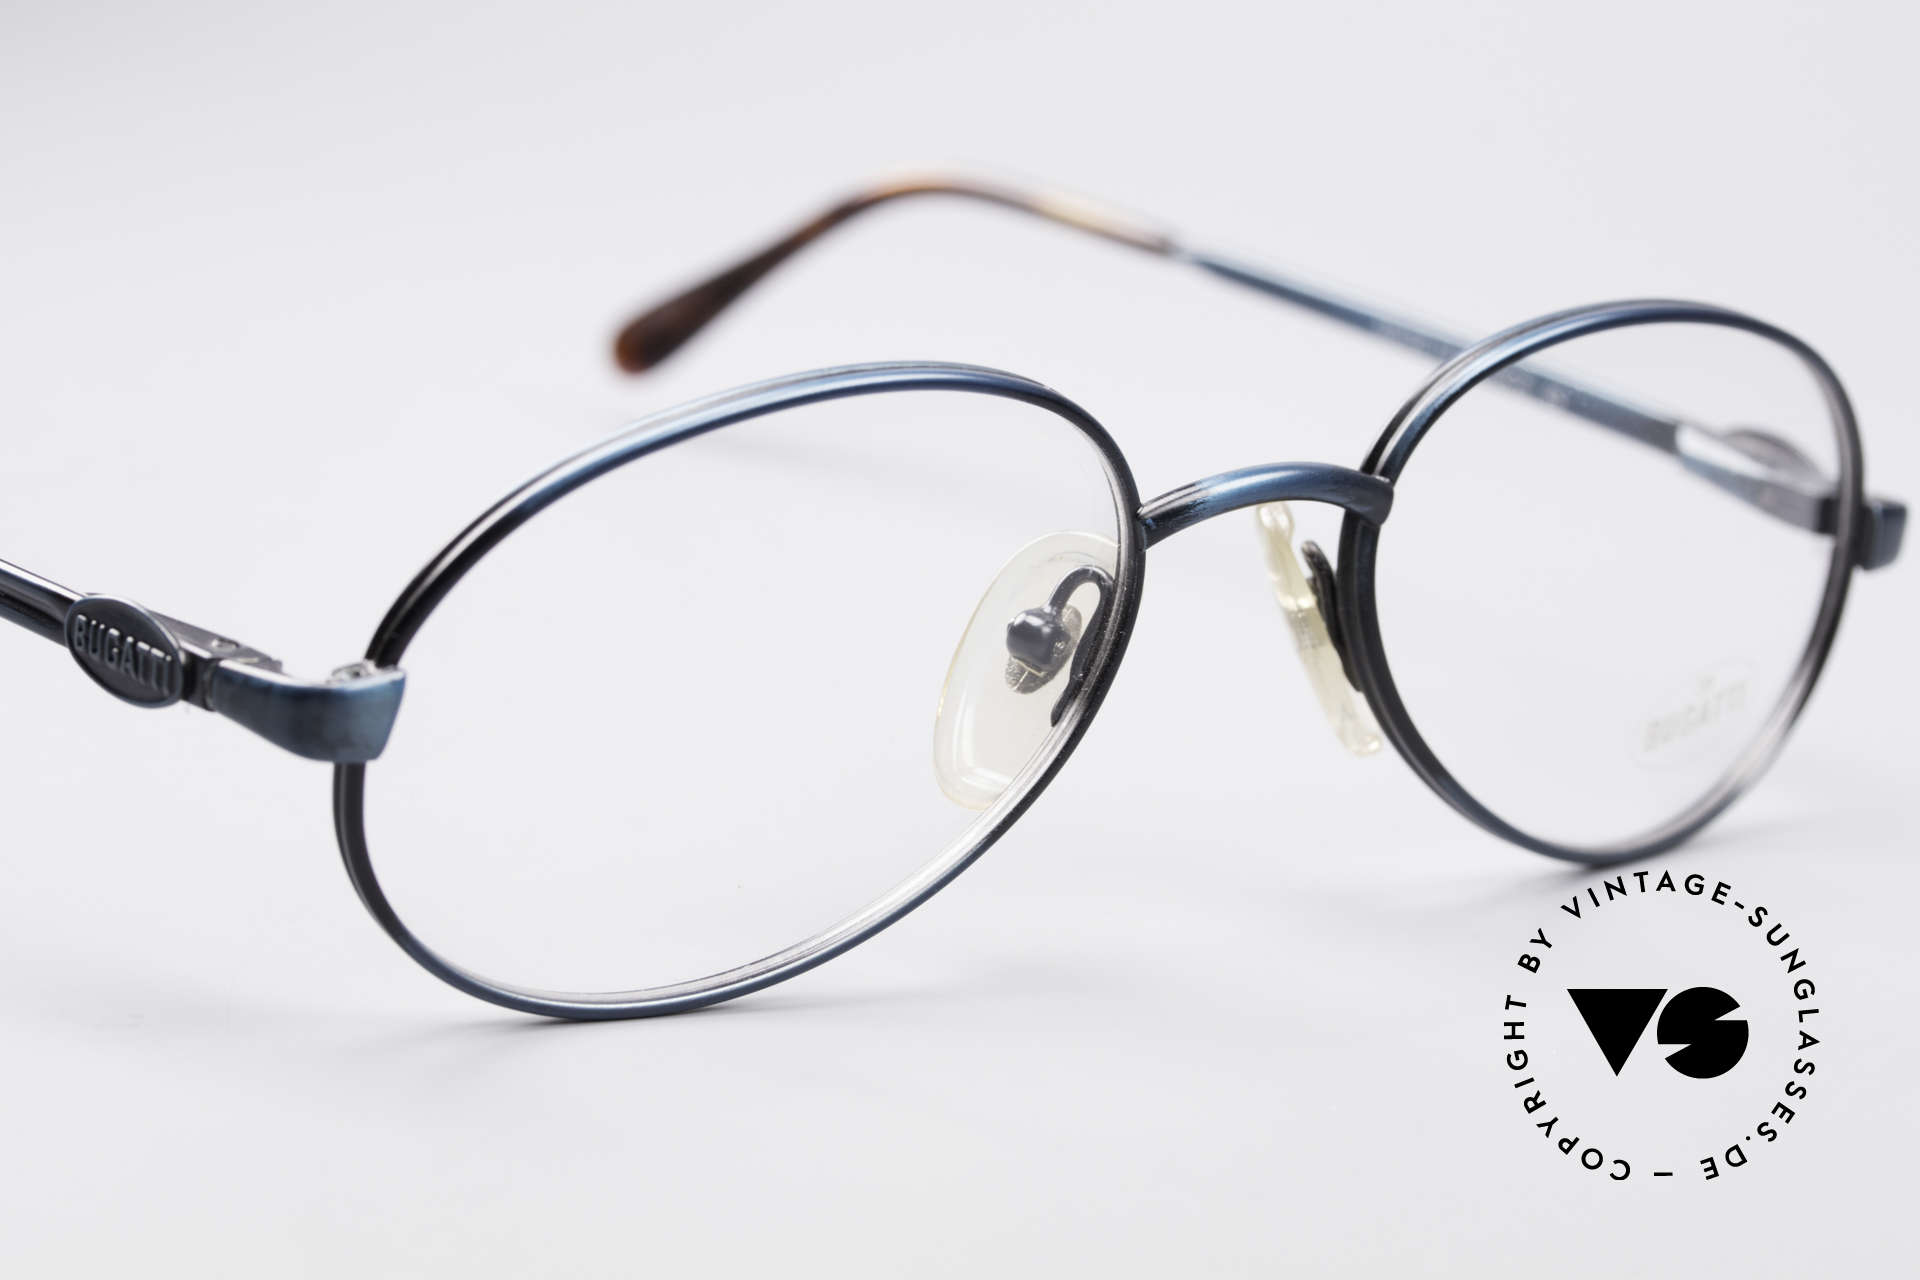 Bugatti 05728 Rare 90's Eyeglasses, unworn (like all our rare vintage Bugatti 90s eyewear), Made for Men